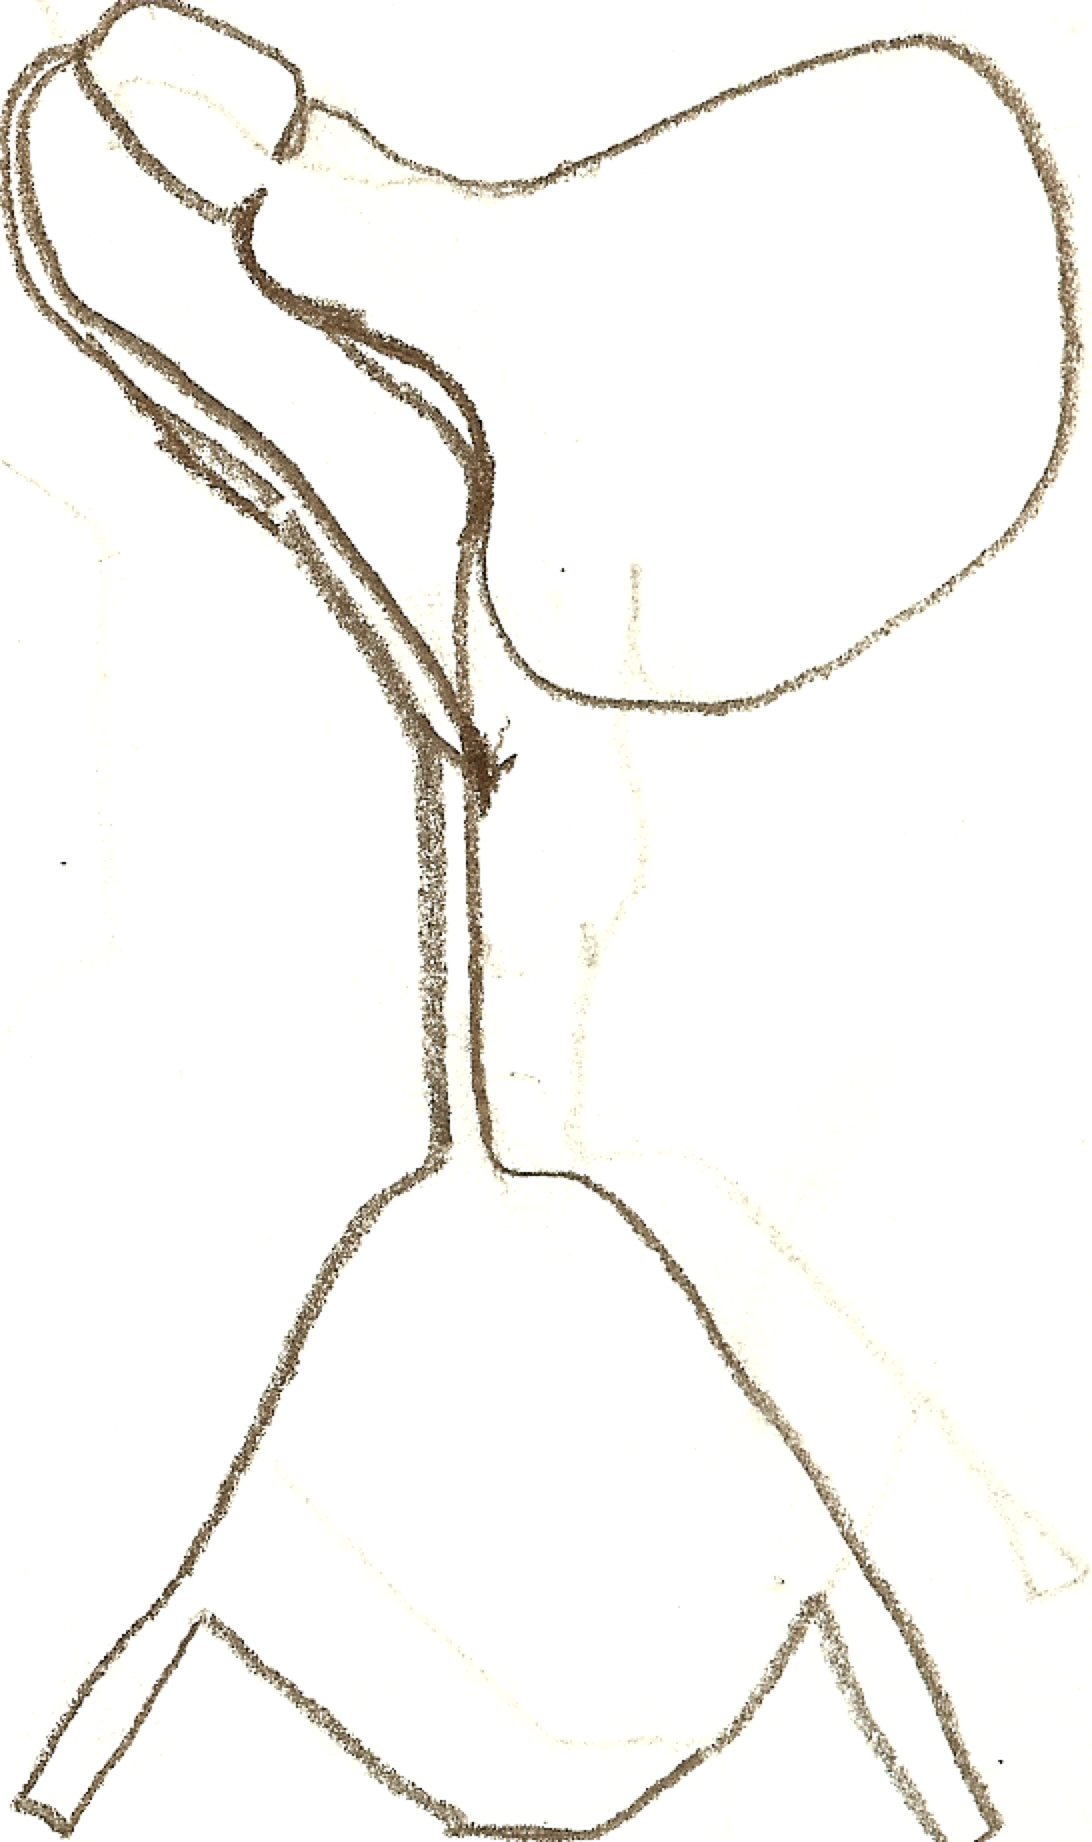 Line Drawing Javascript : Angelo hudson contour line drawing lamp